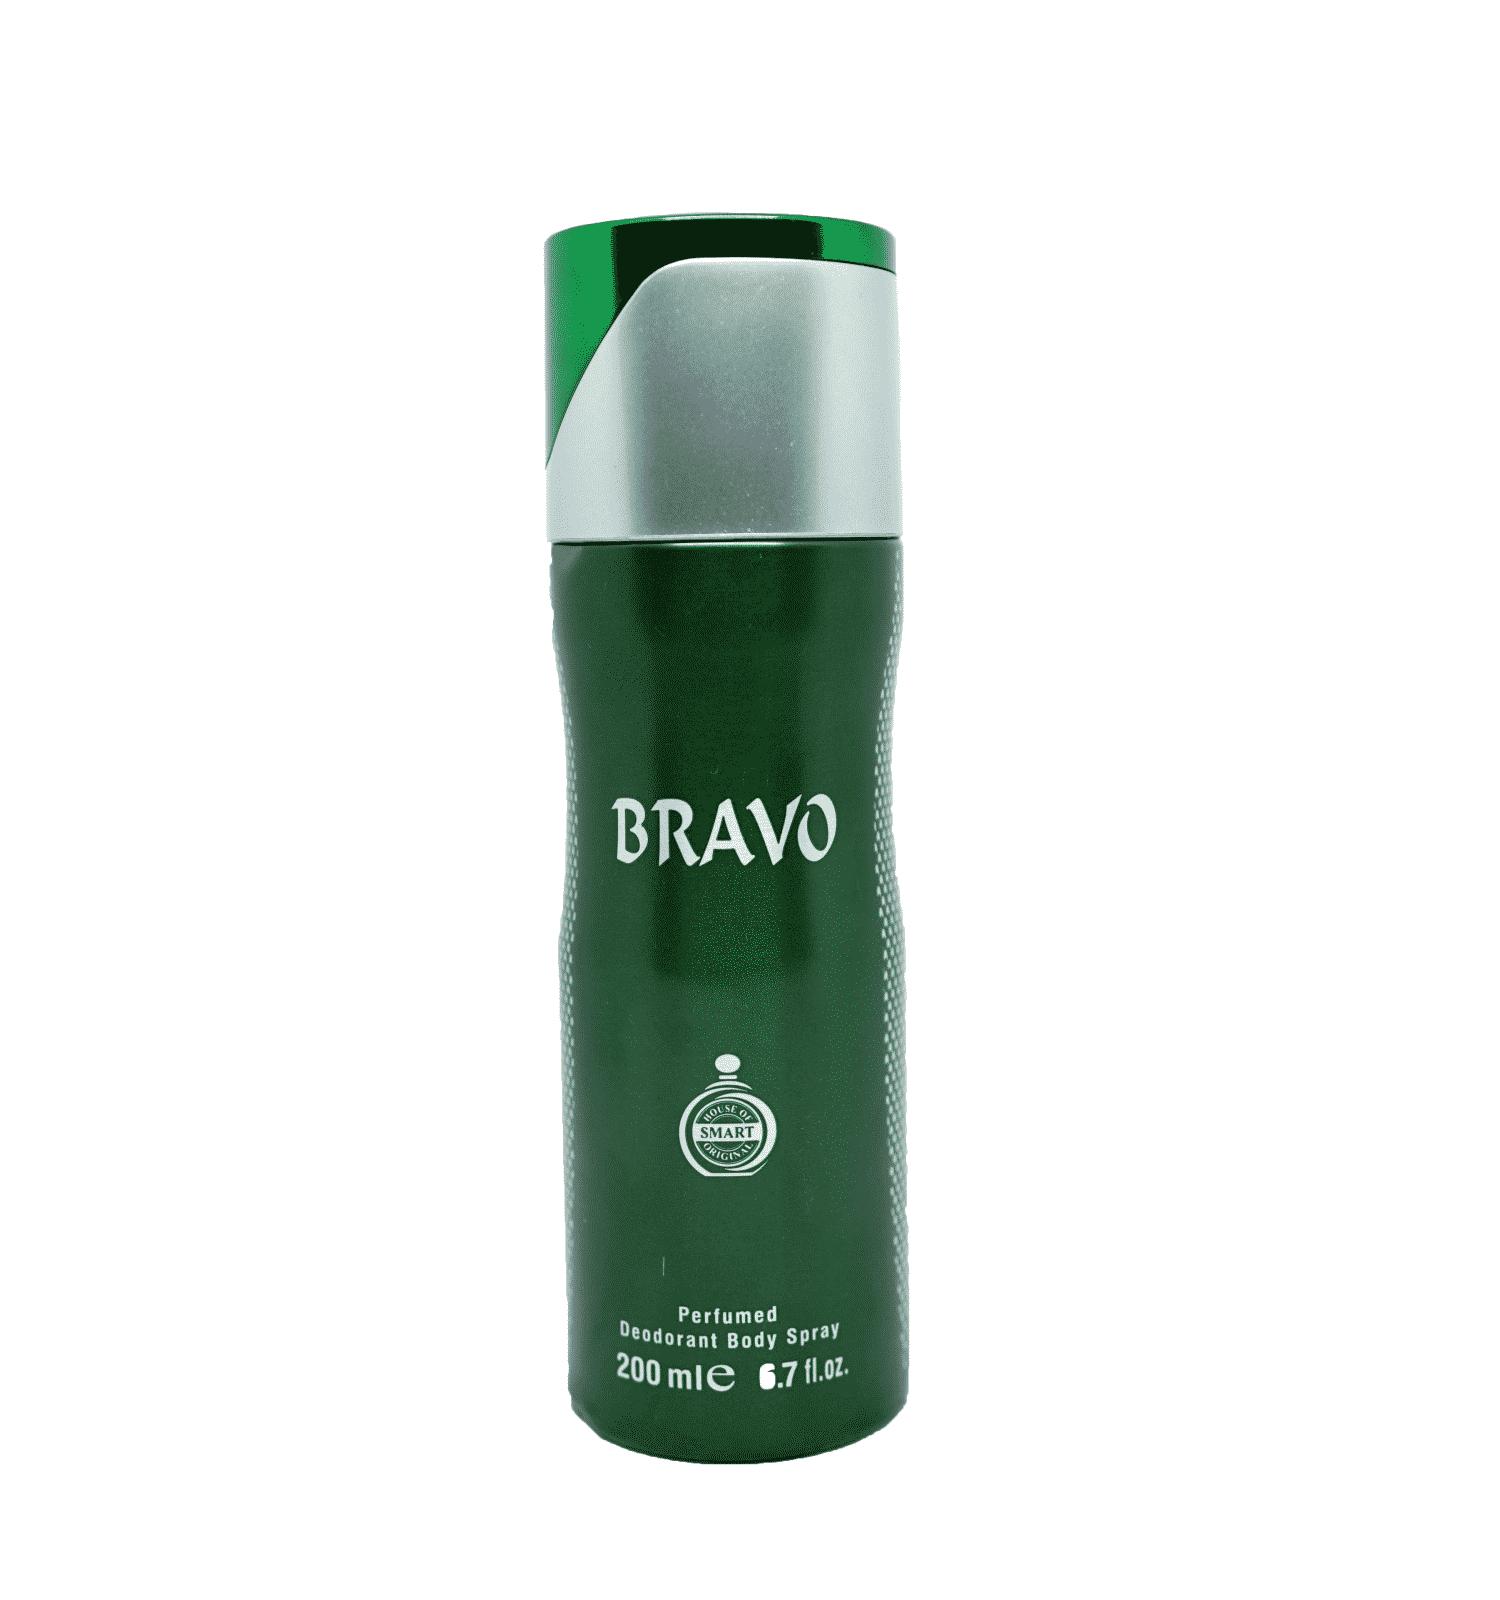 Bravo Smart Body Spray 200ml